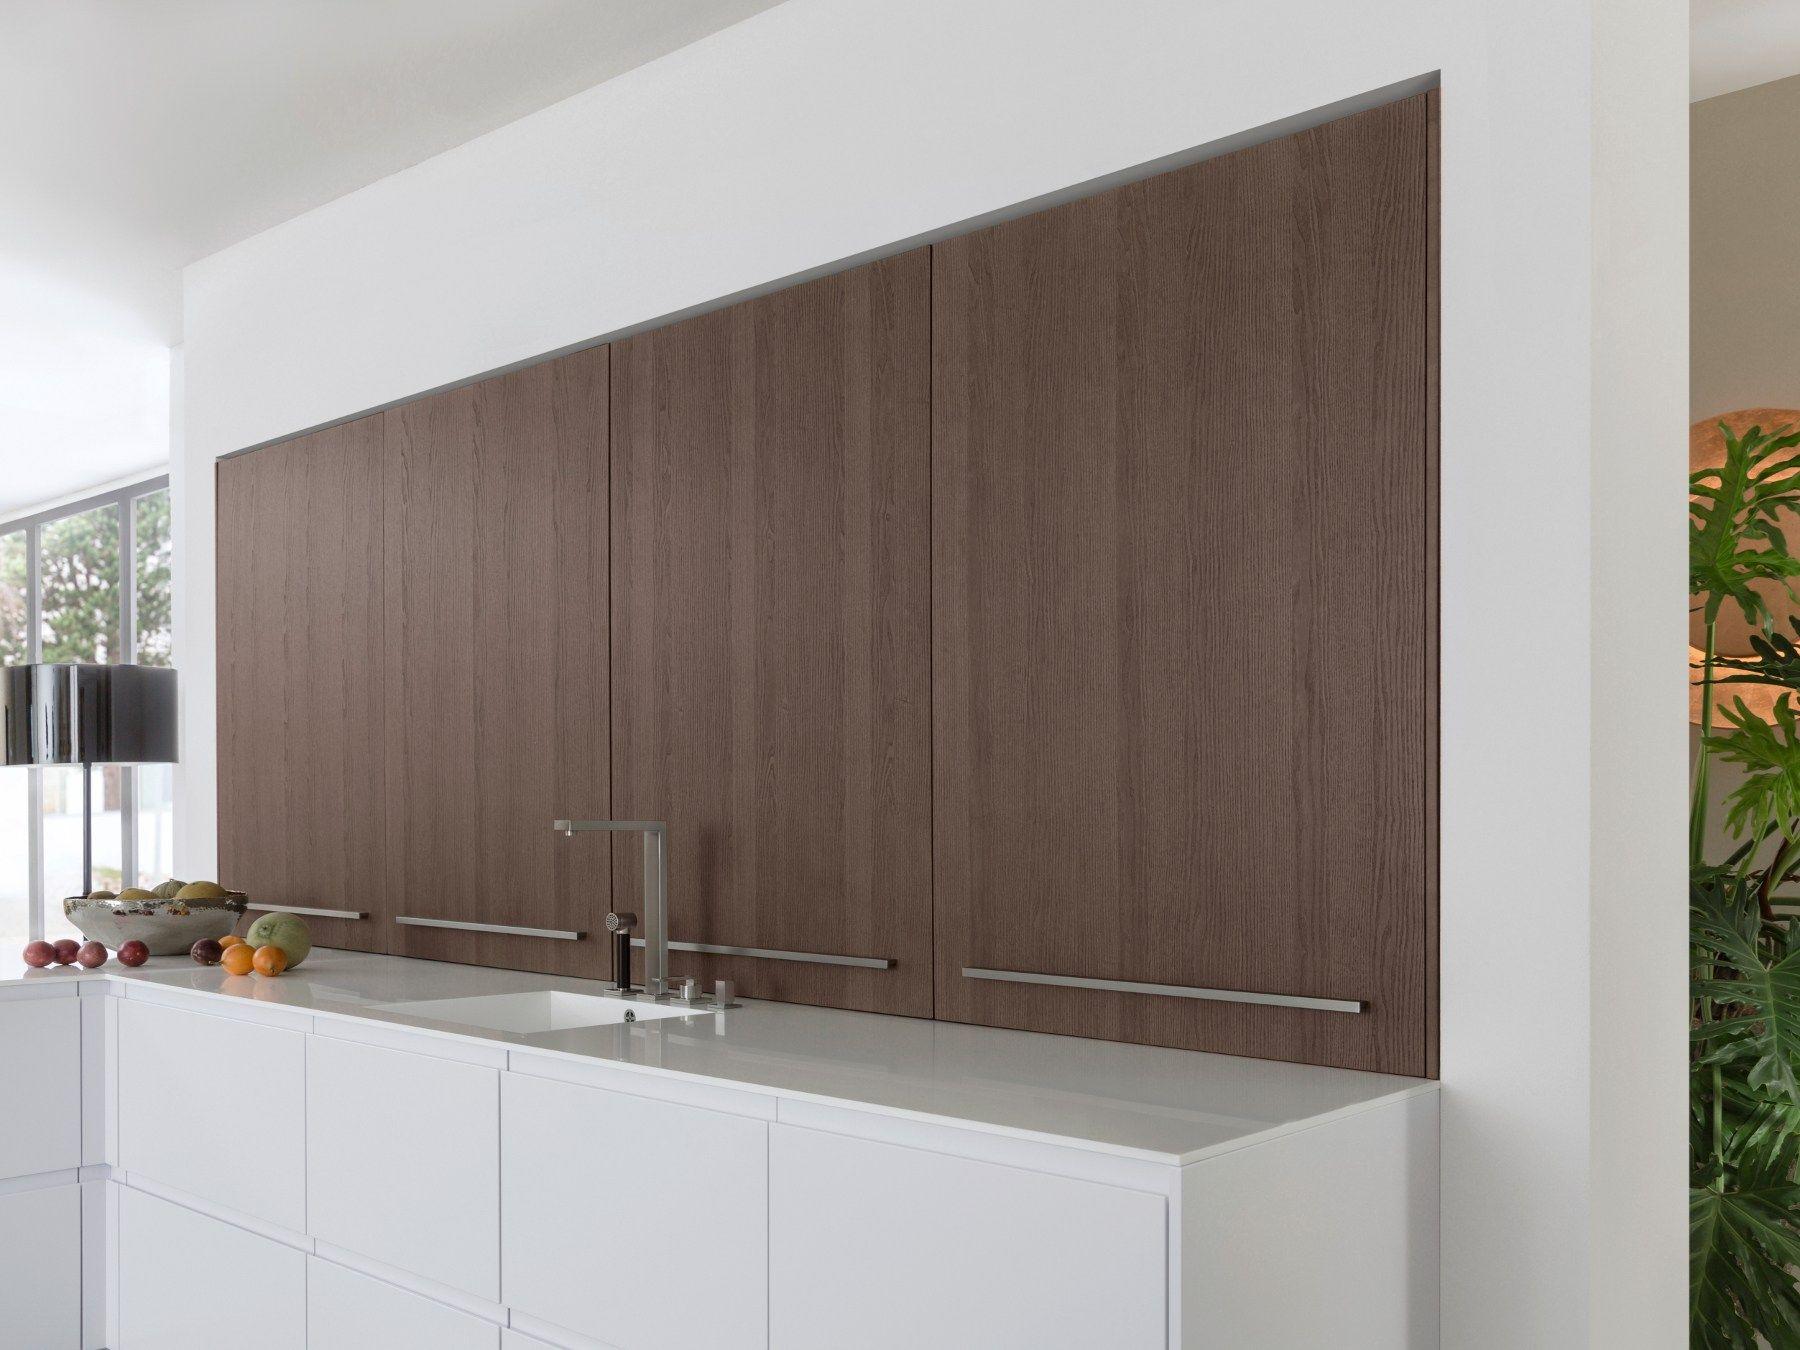 emejing leicht küchen katalog ideas - home design ideas - milbank.us - Leicht Küchen Katalog